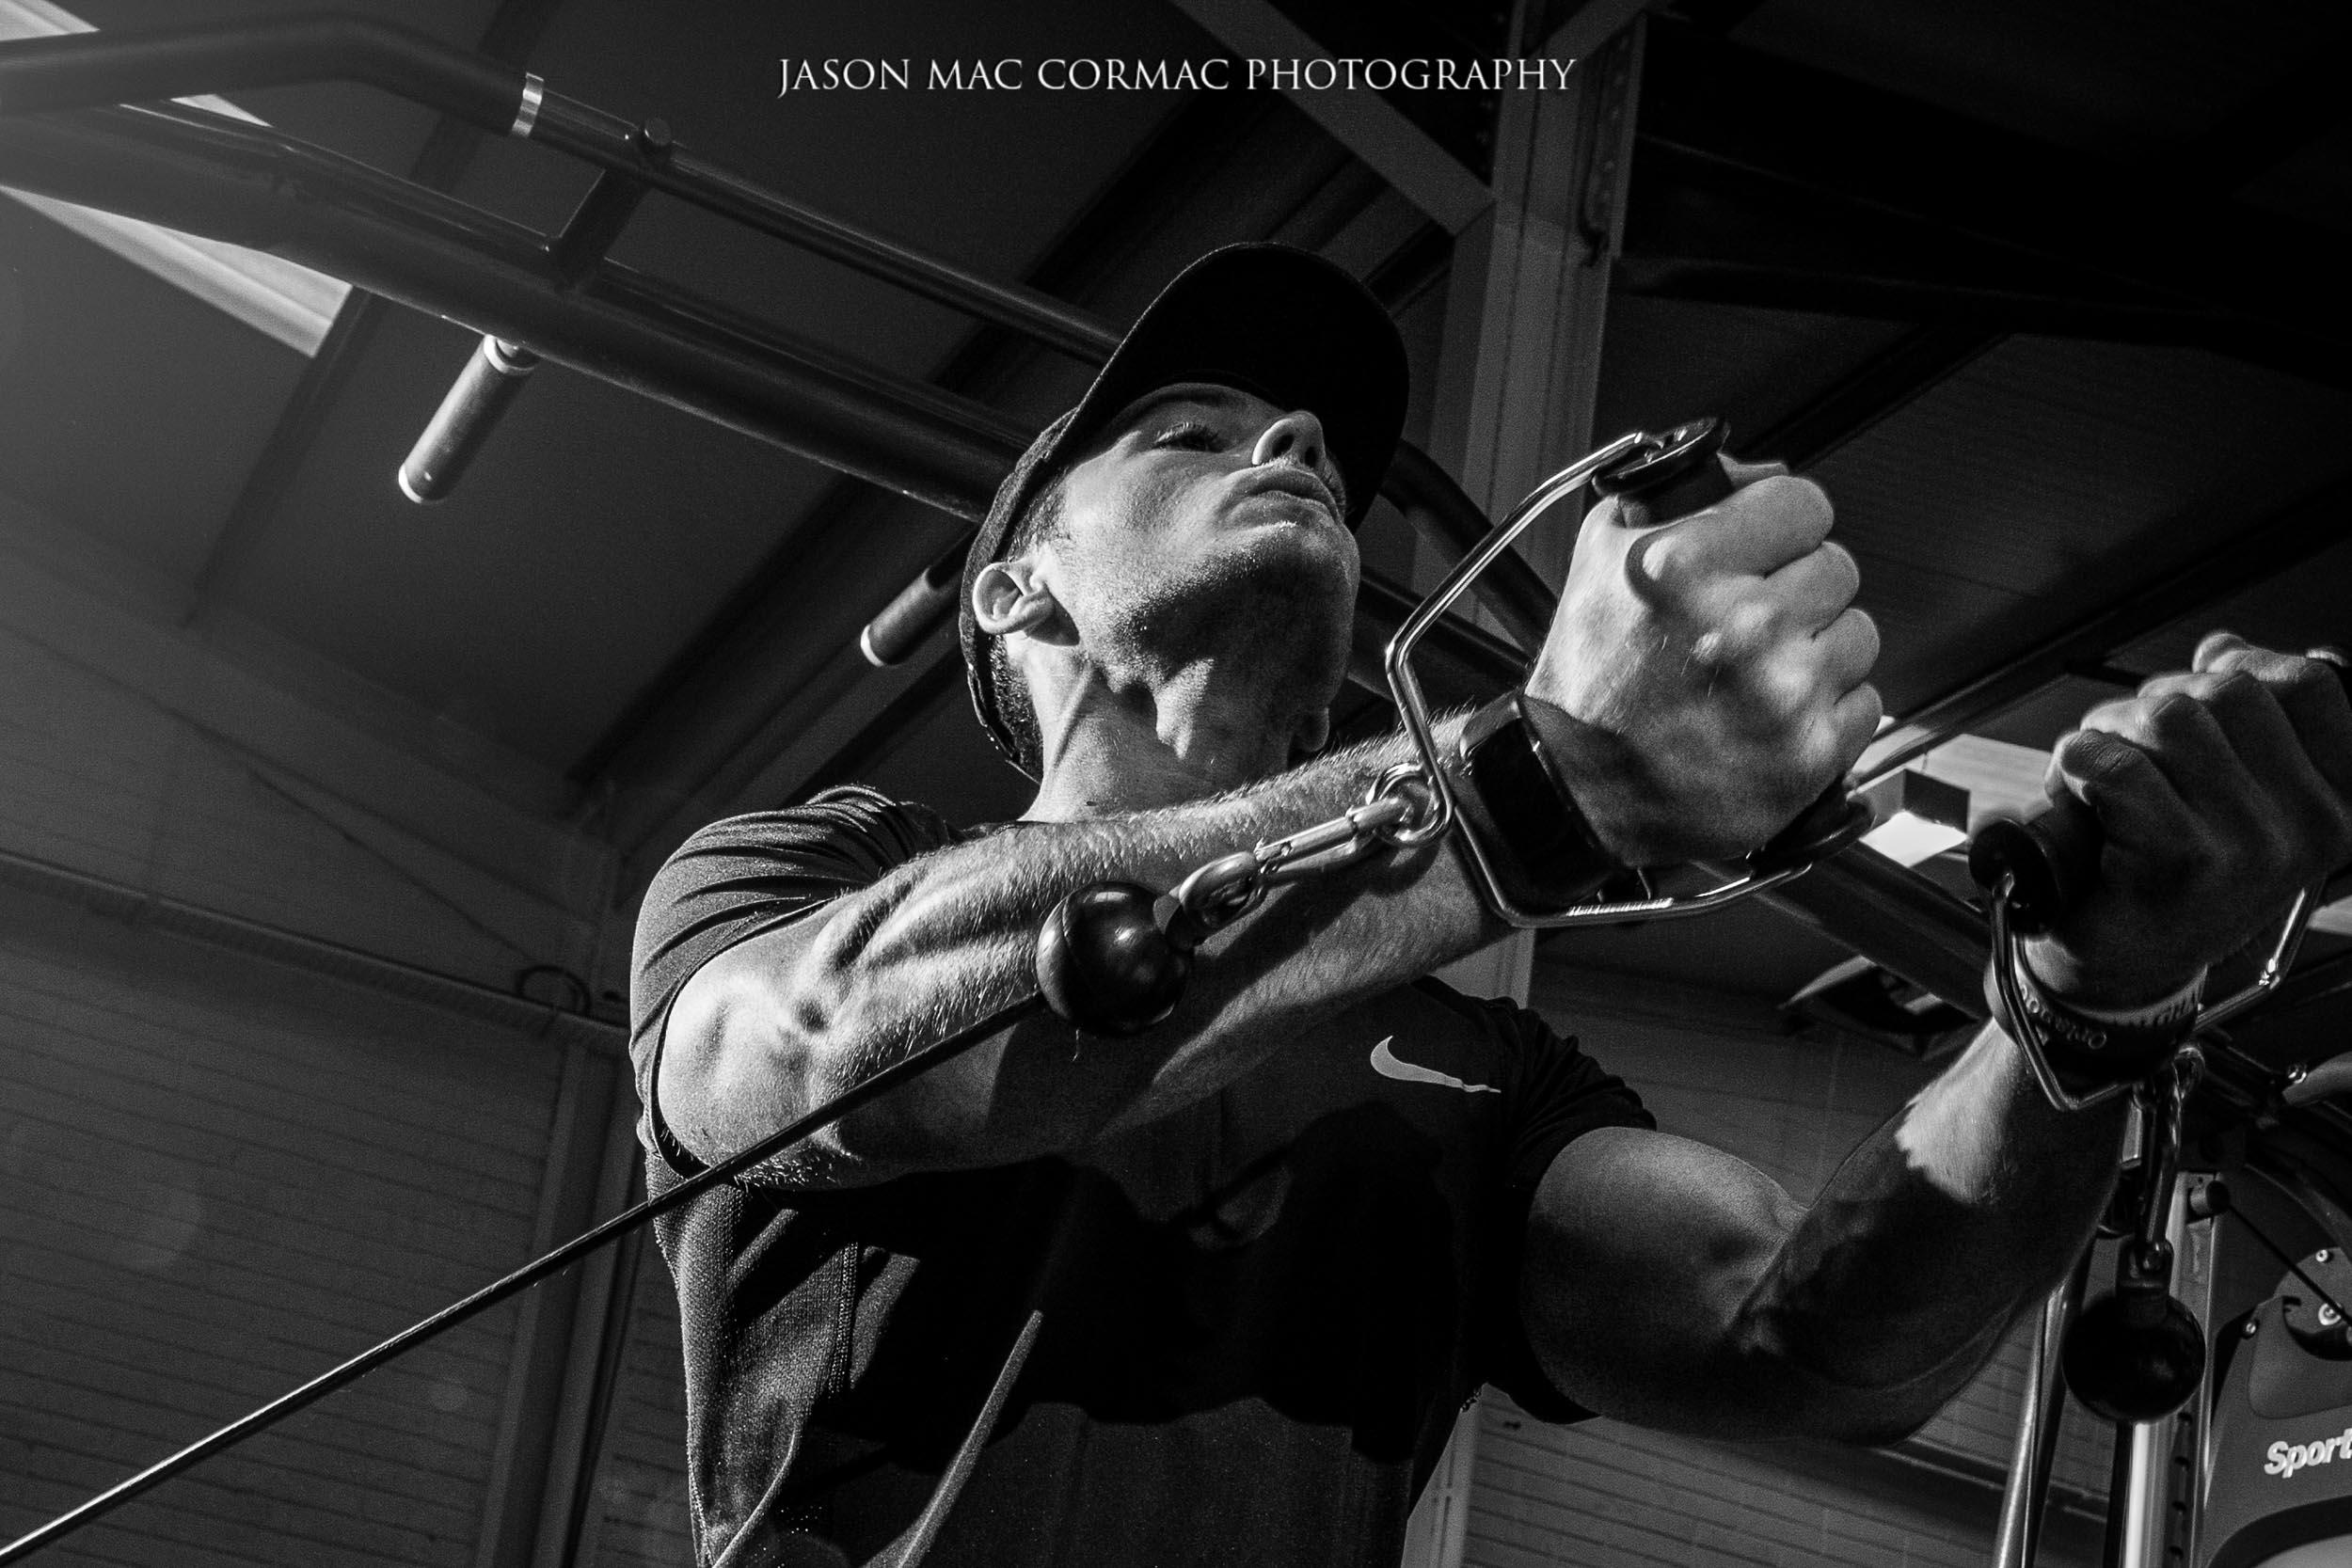 IMG_8854 - Dublin Photographer Jason Mac Cormac-Edit-2.jpg